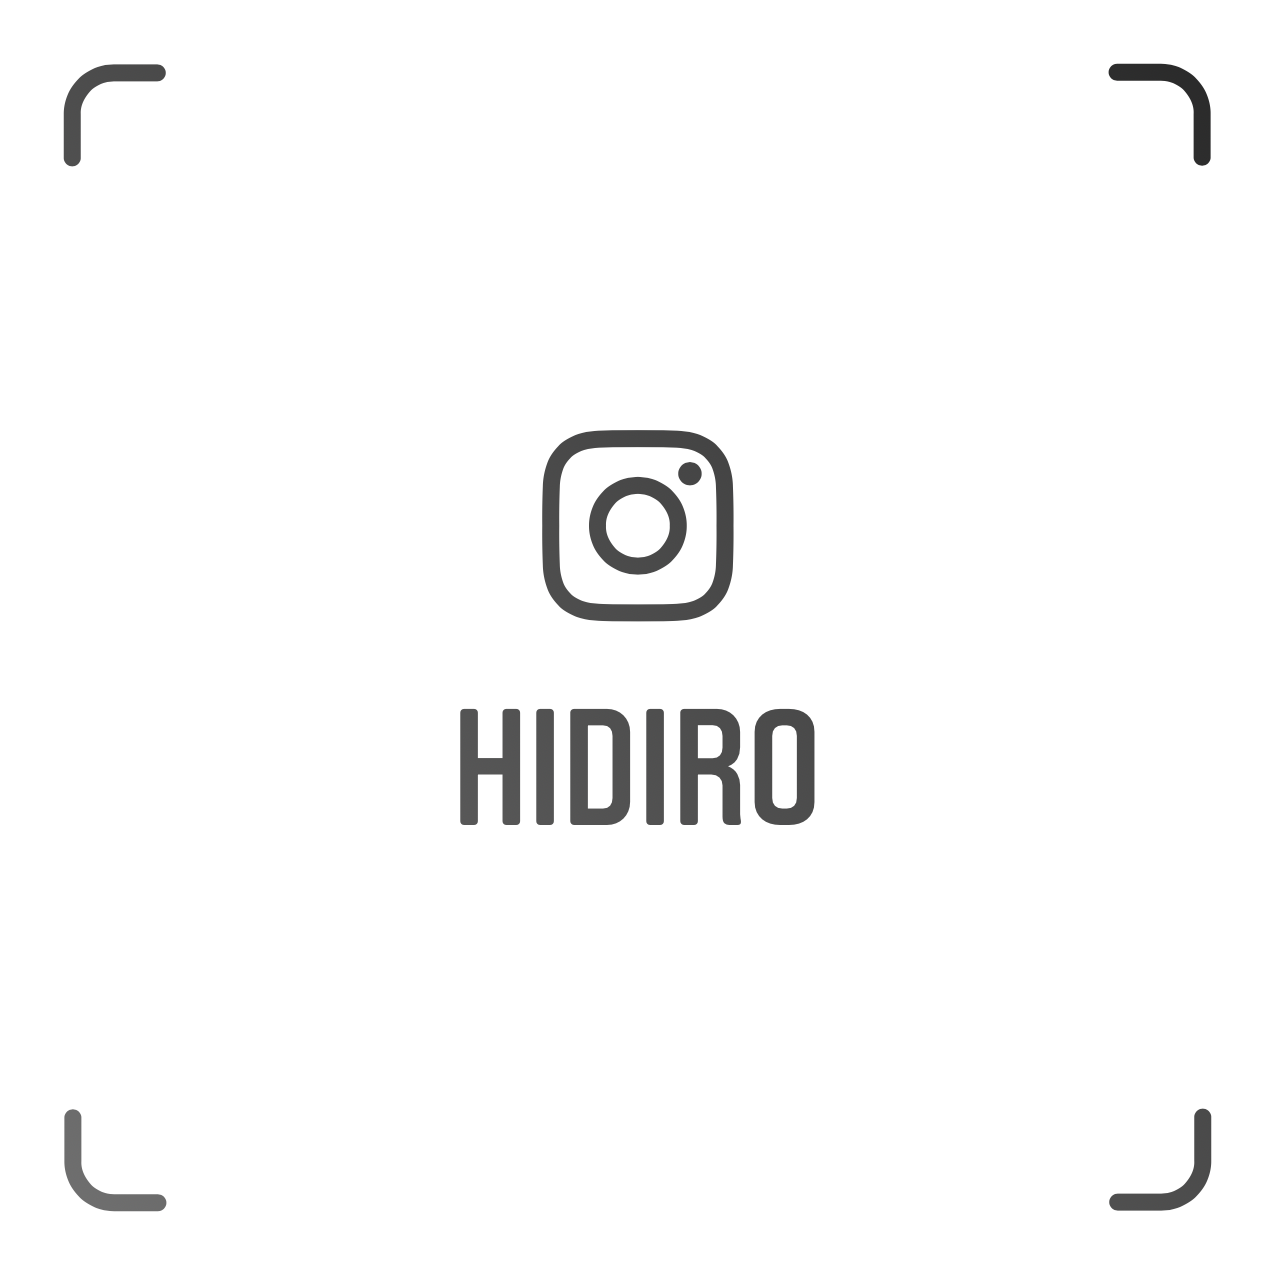 hidiro_nametag-2